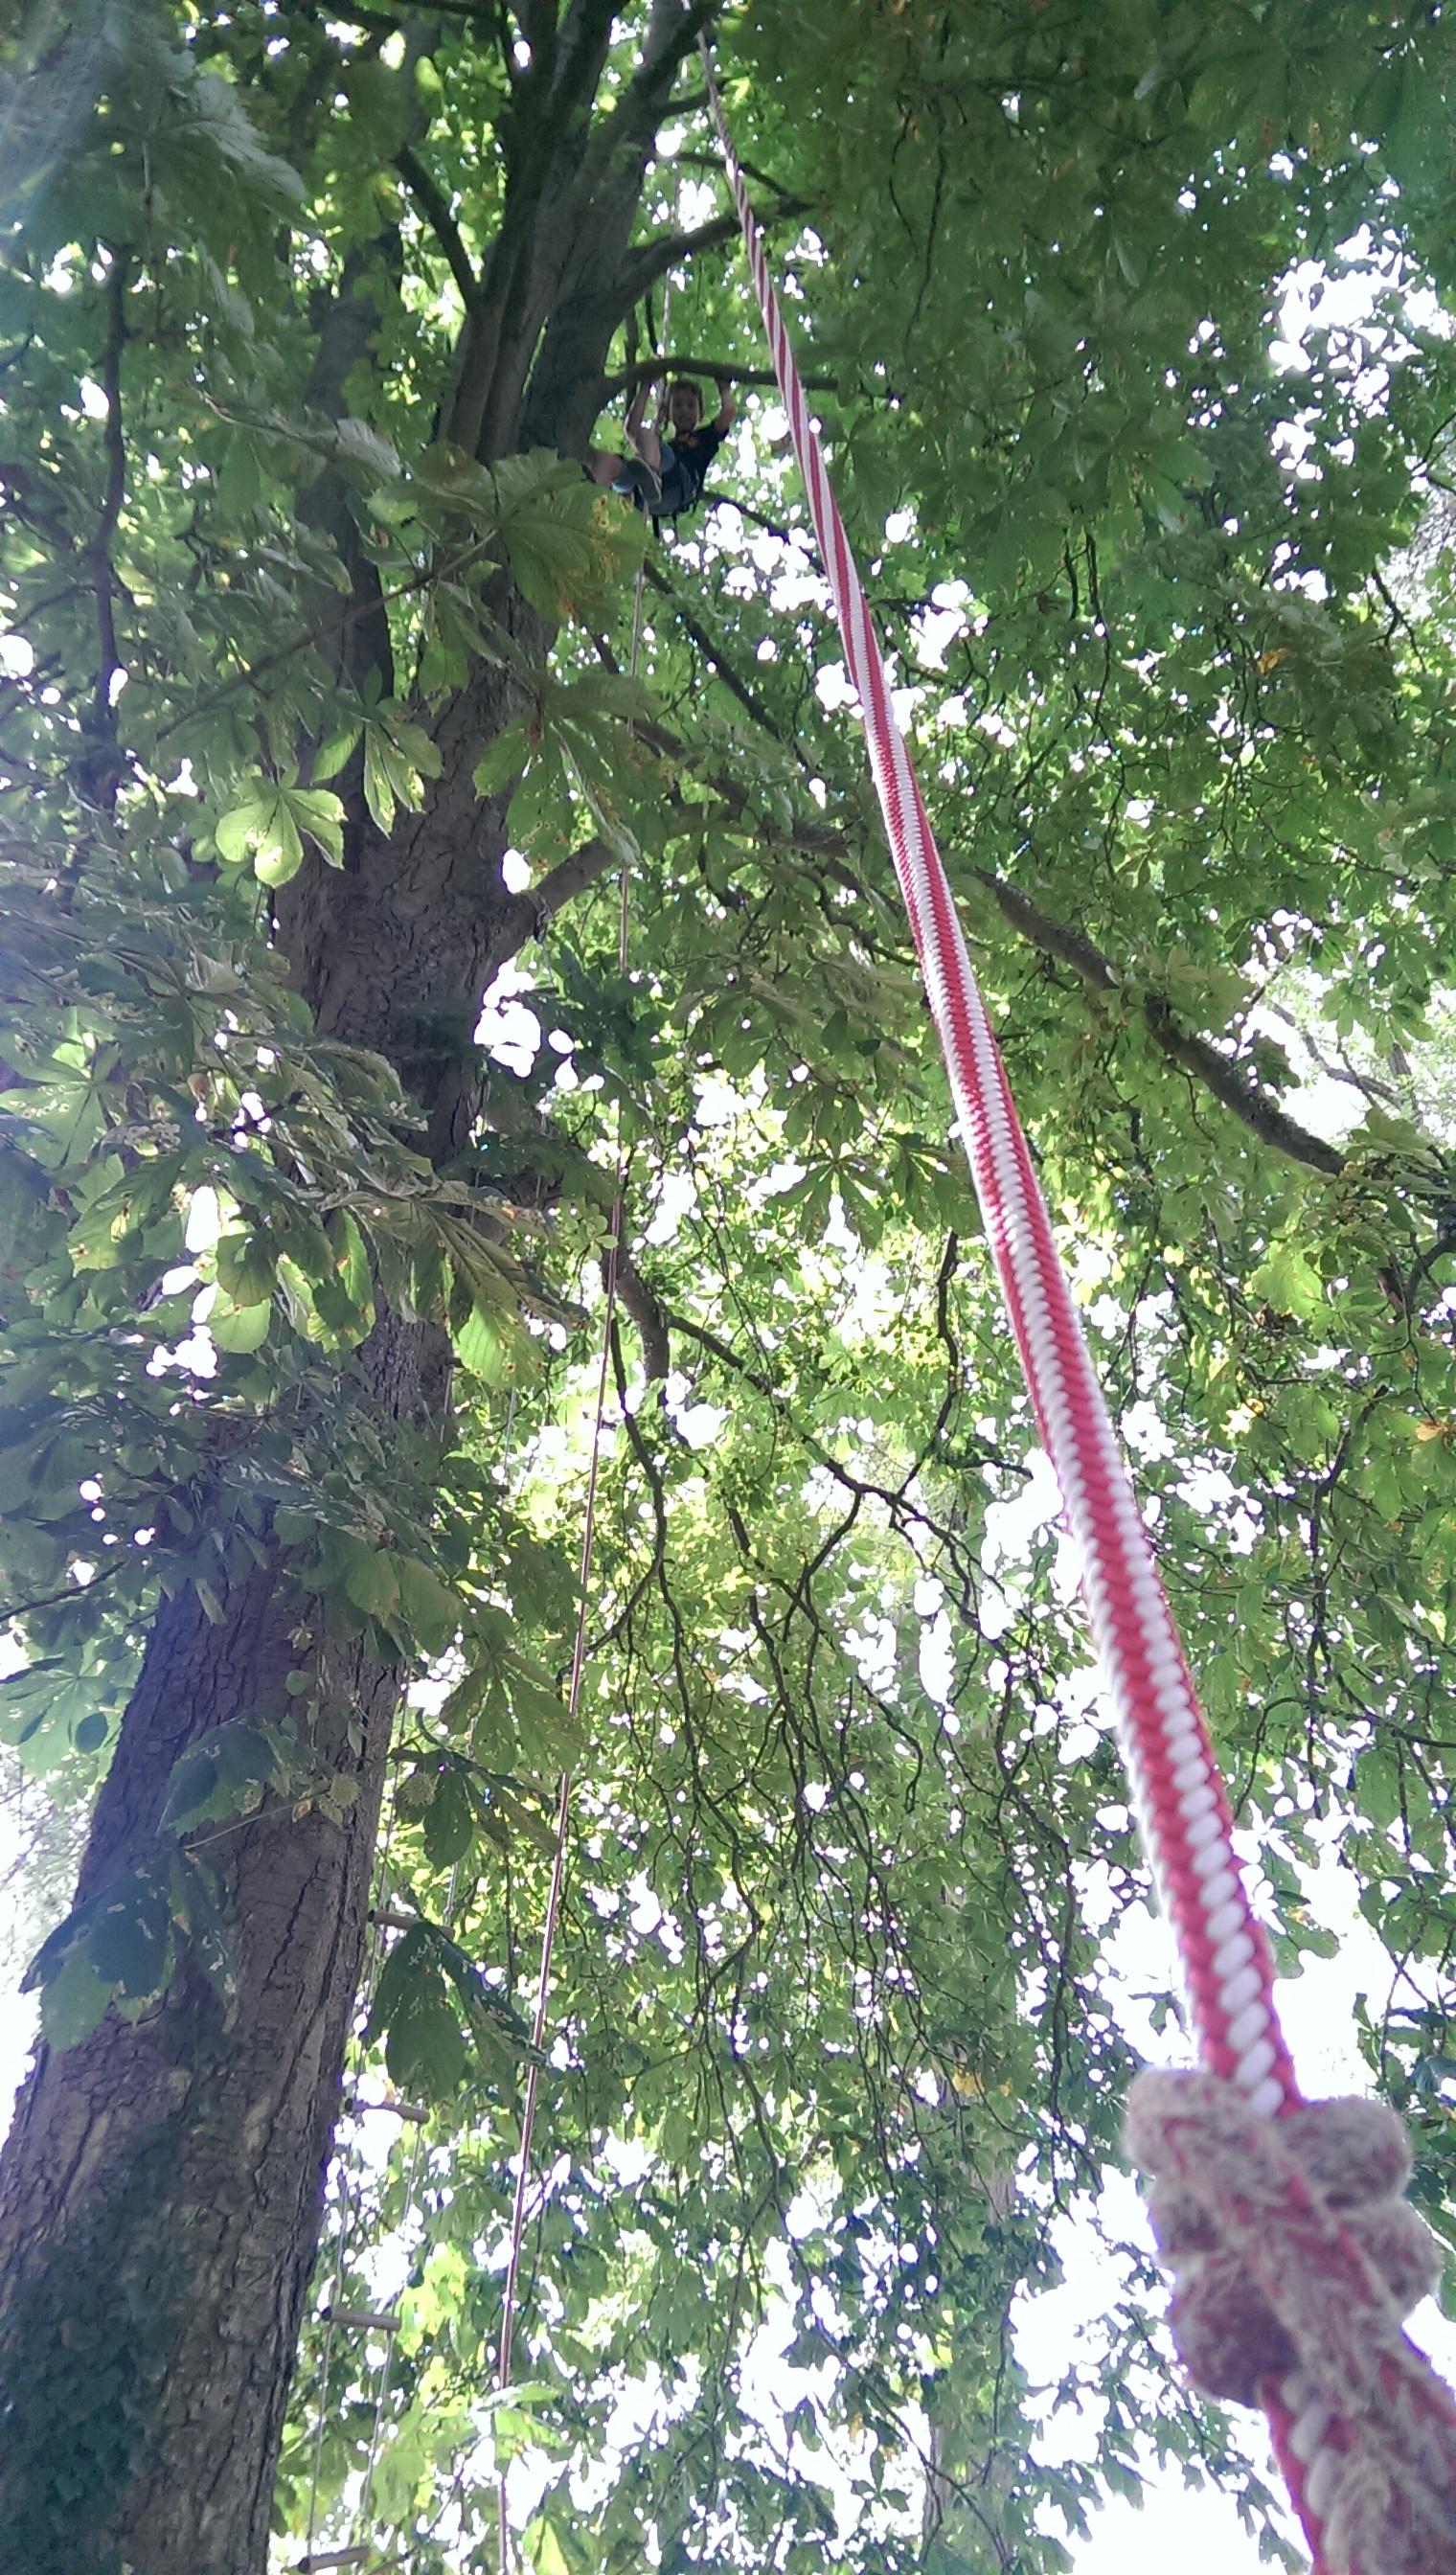 Arbr'acadabra grimpe d'arbre